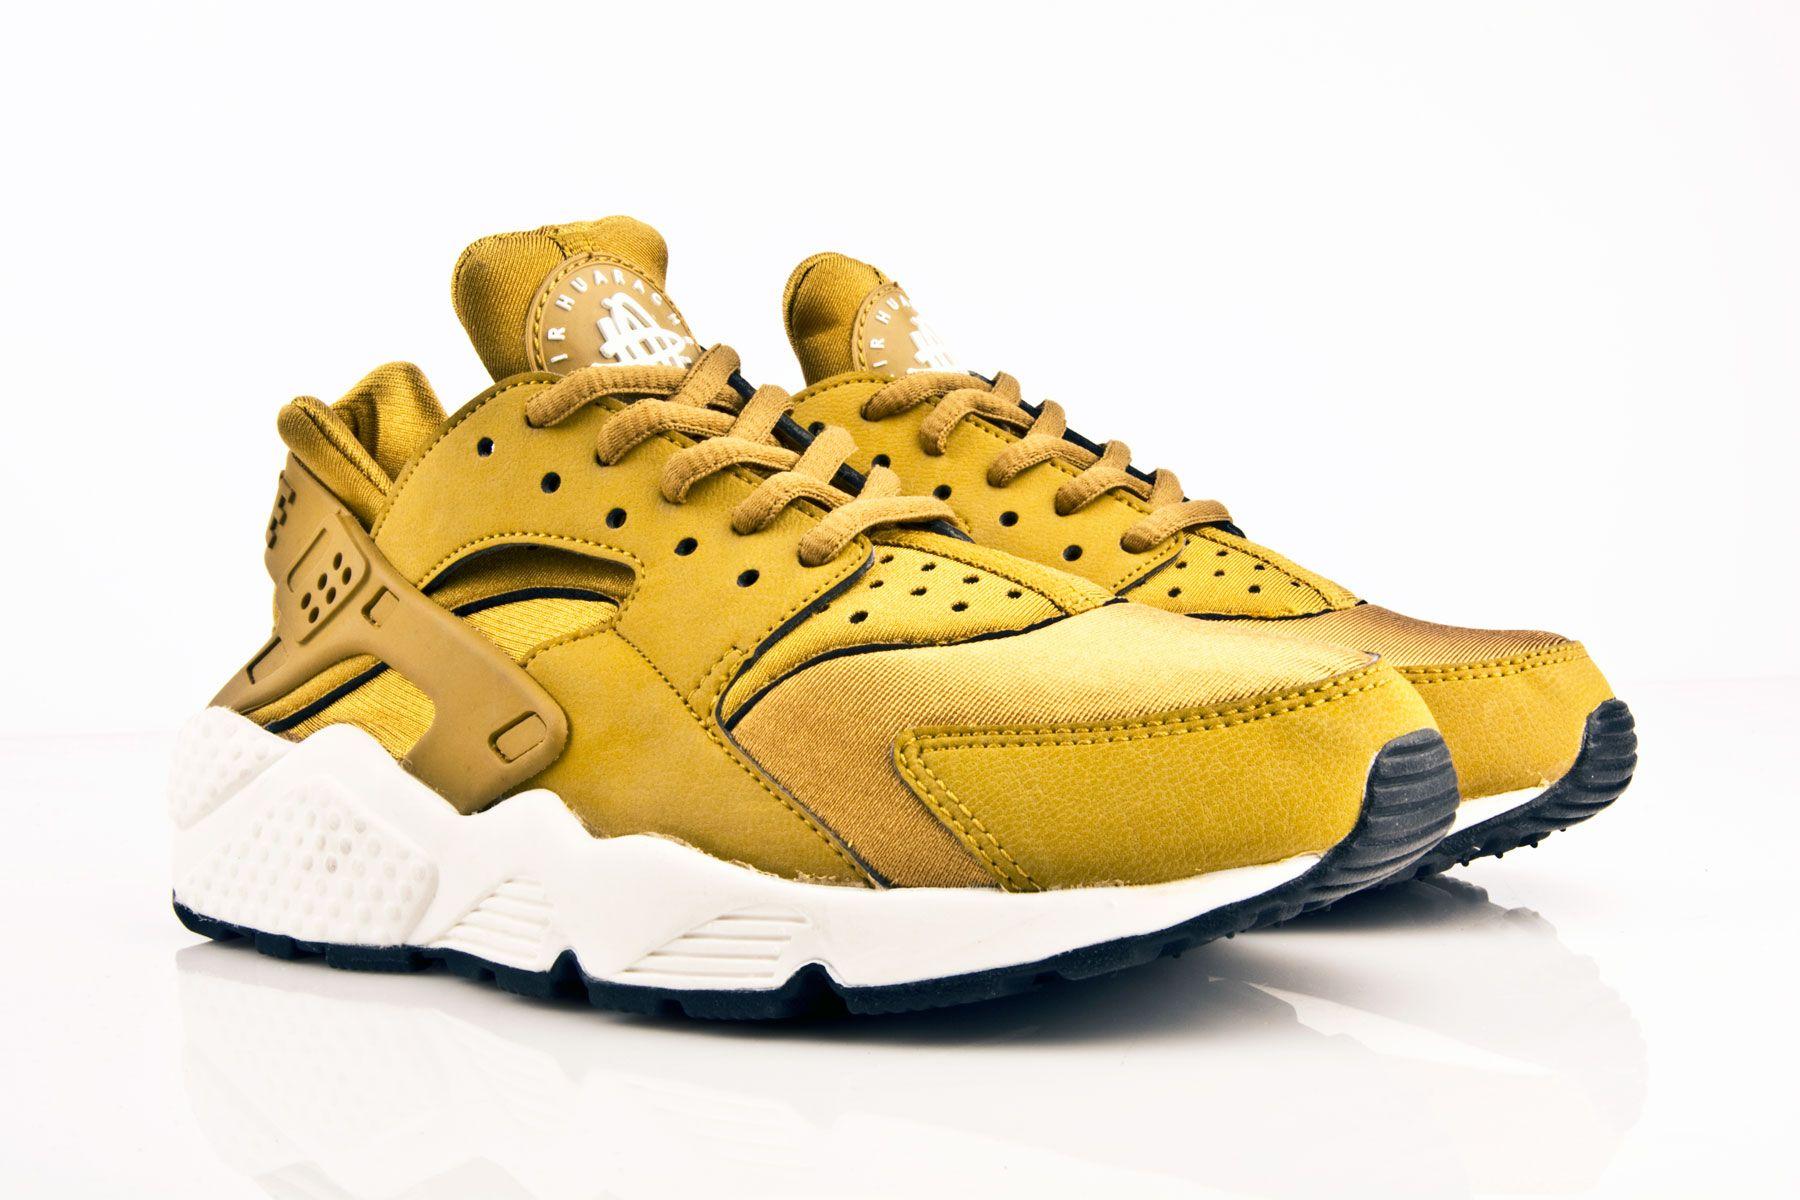 separation shoes 75f2b 111ea Nike Air Huarache Gold 02 Coolsneakers